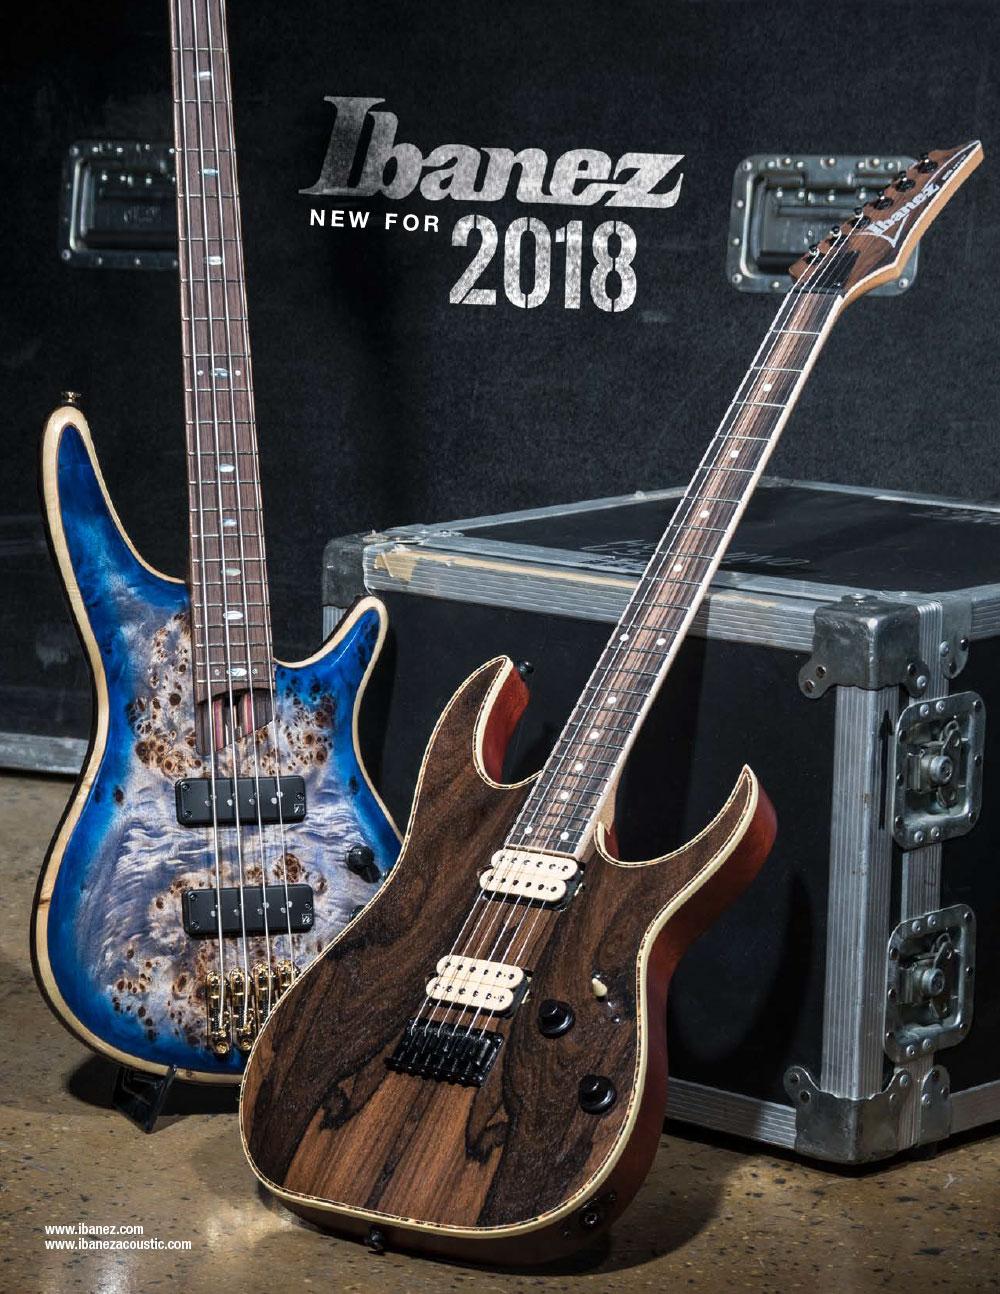 Ibanez Catalog 2018 News